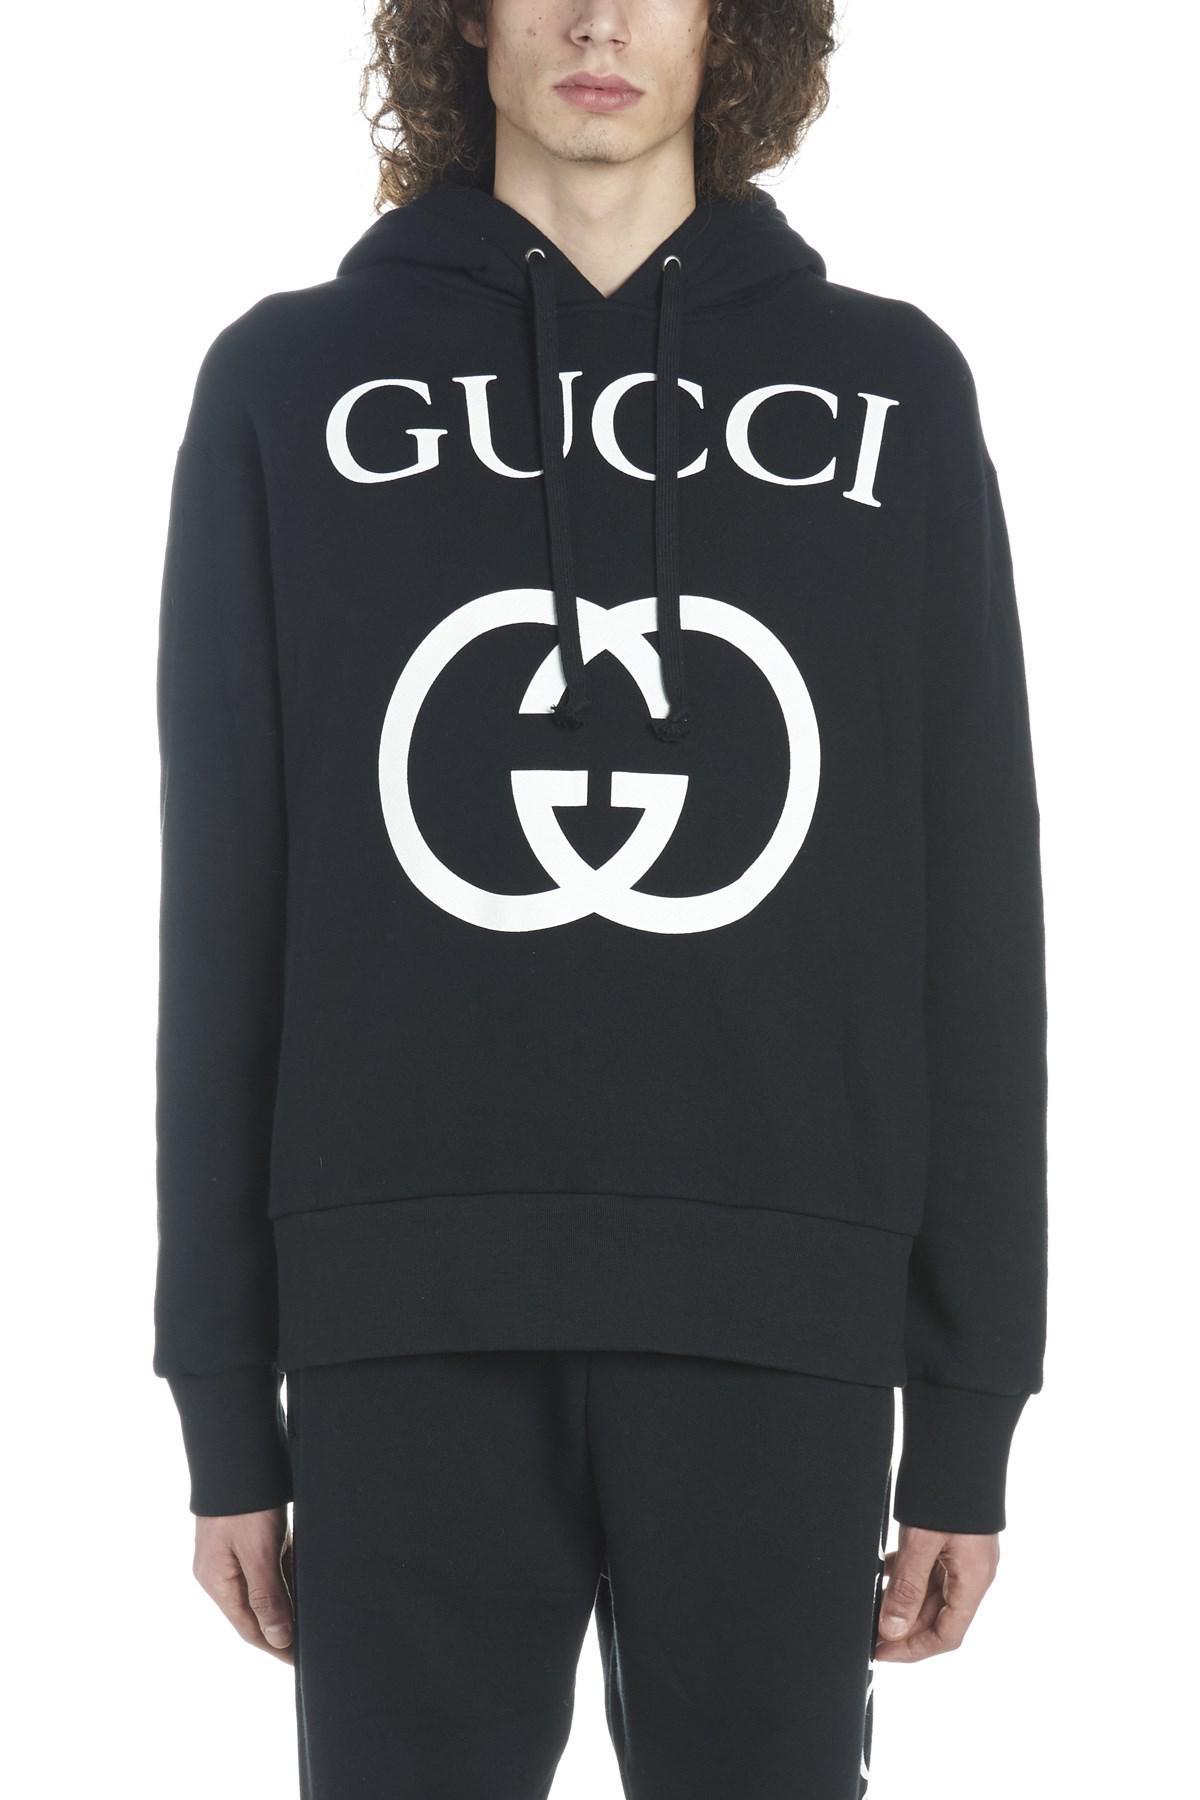 9c3075874c2 Lyst - Gucci  interlocking G  Hoodie in Black for Men